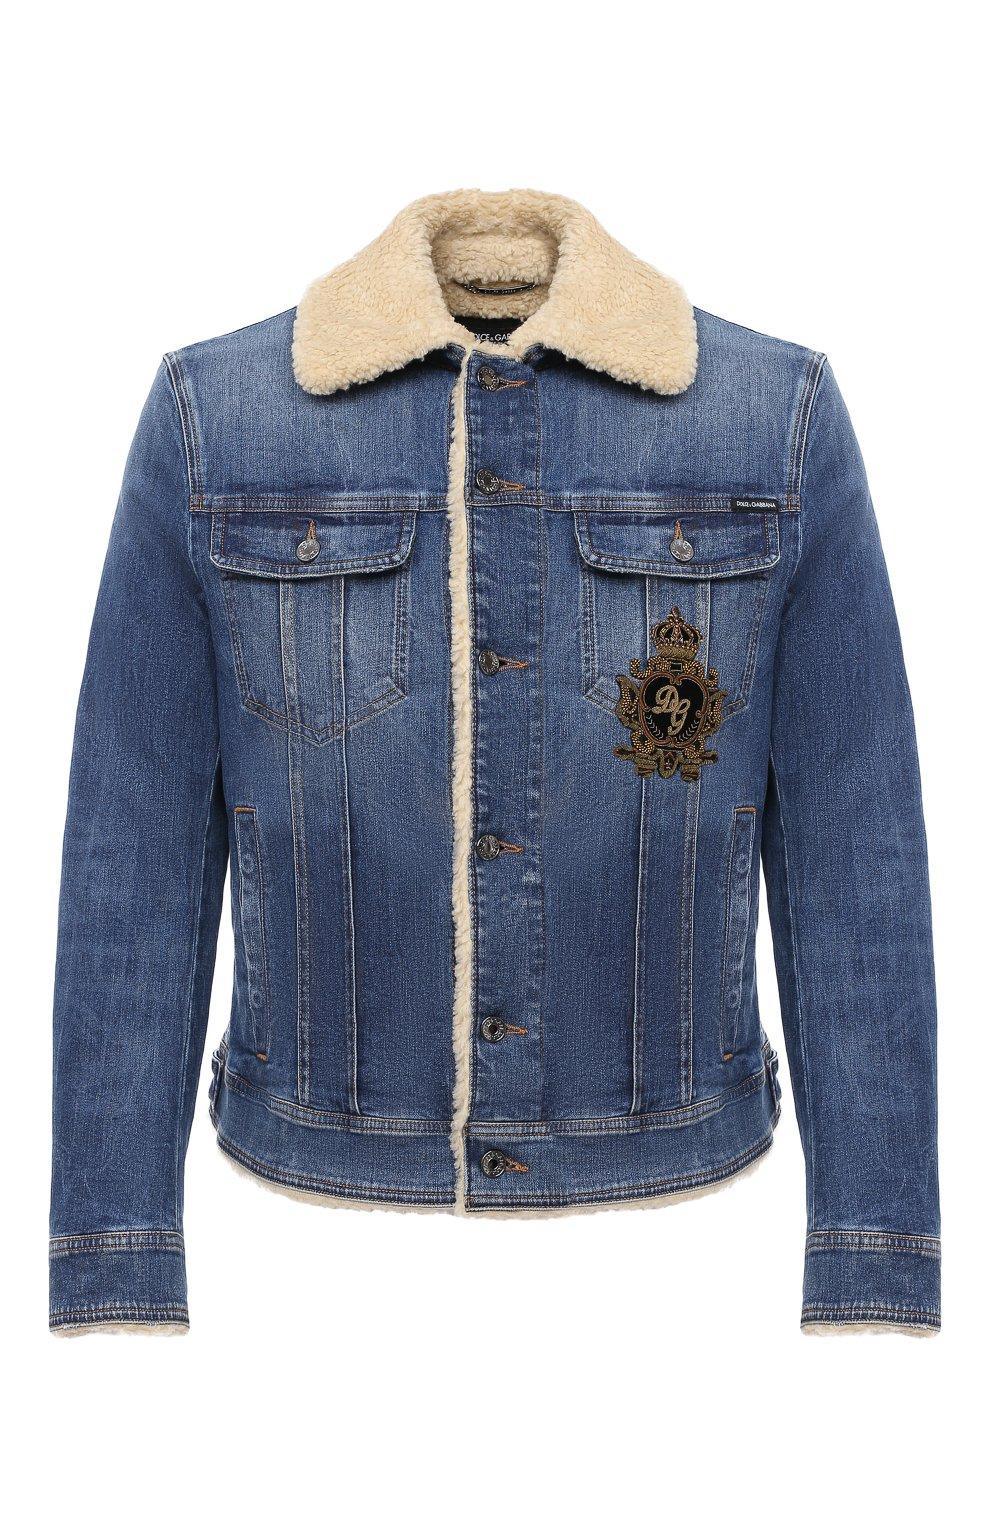 Мужская джинсовая куртка DOLCE & GABBANA темно-синего цвета, арт. G9JB5Z/G8CR9 | Фото 1